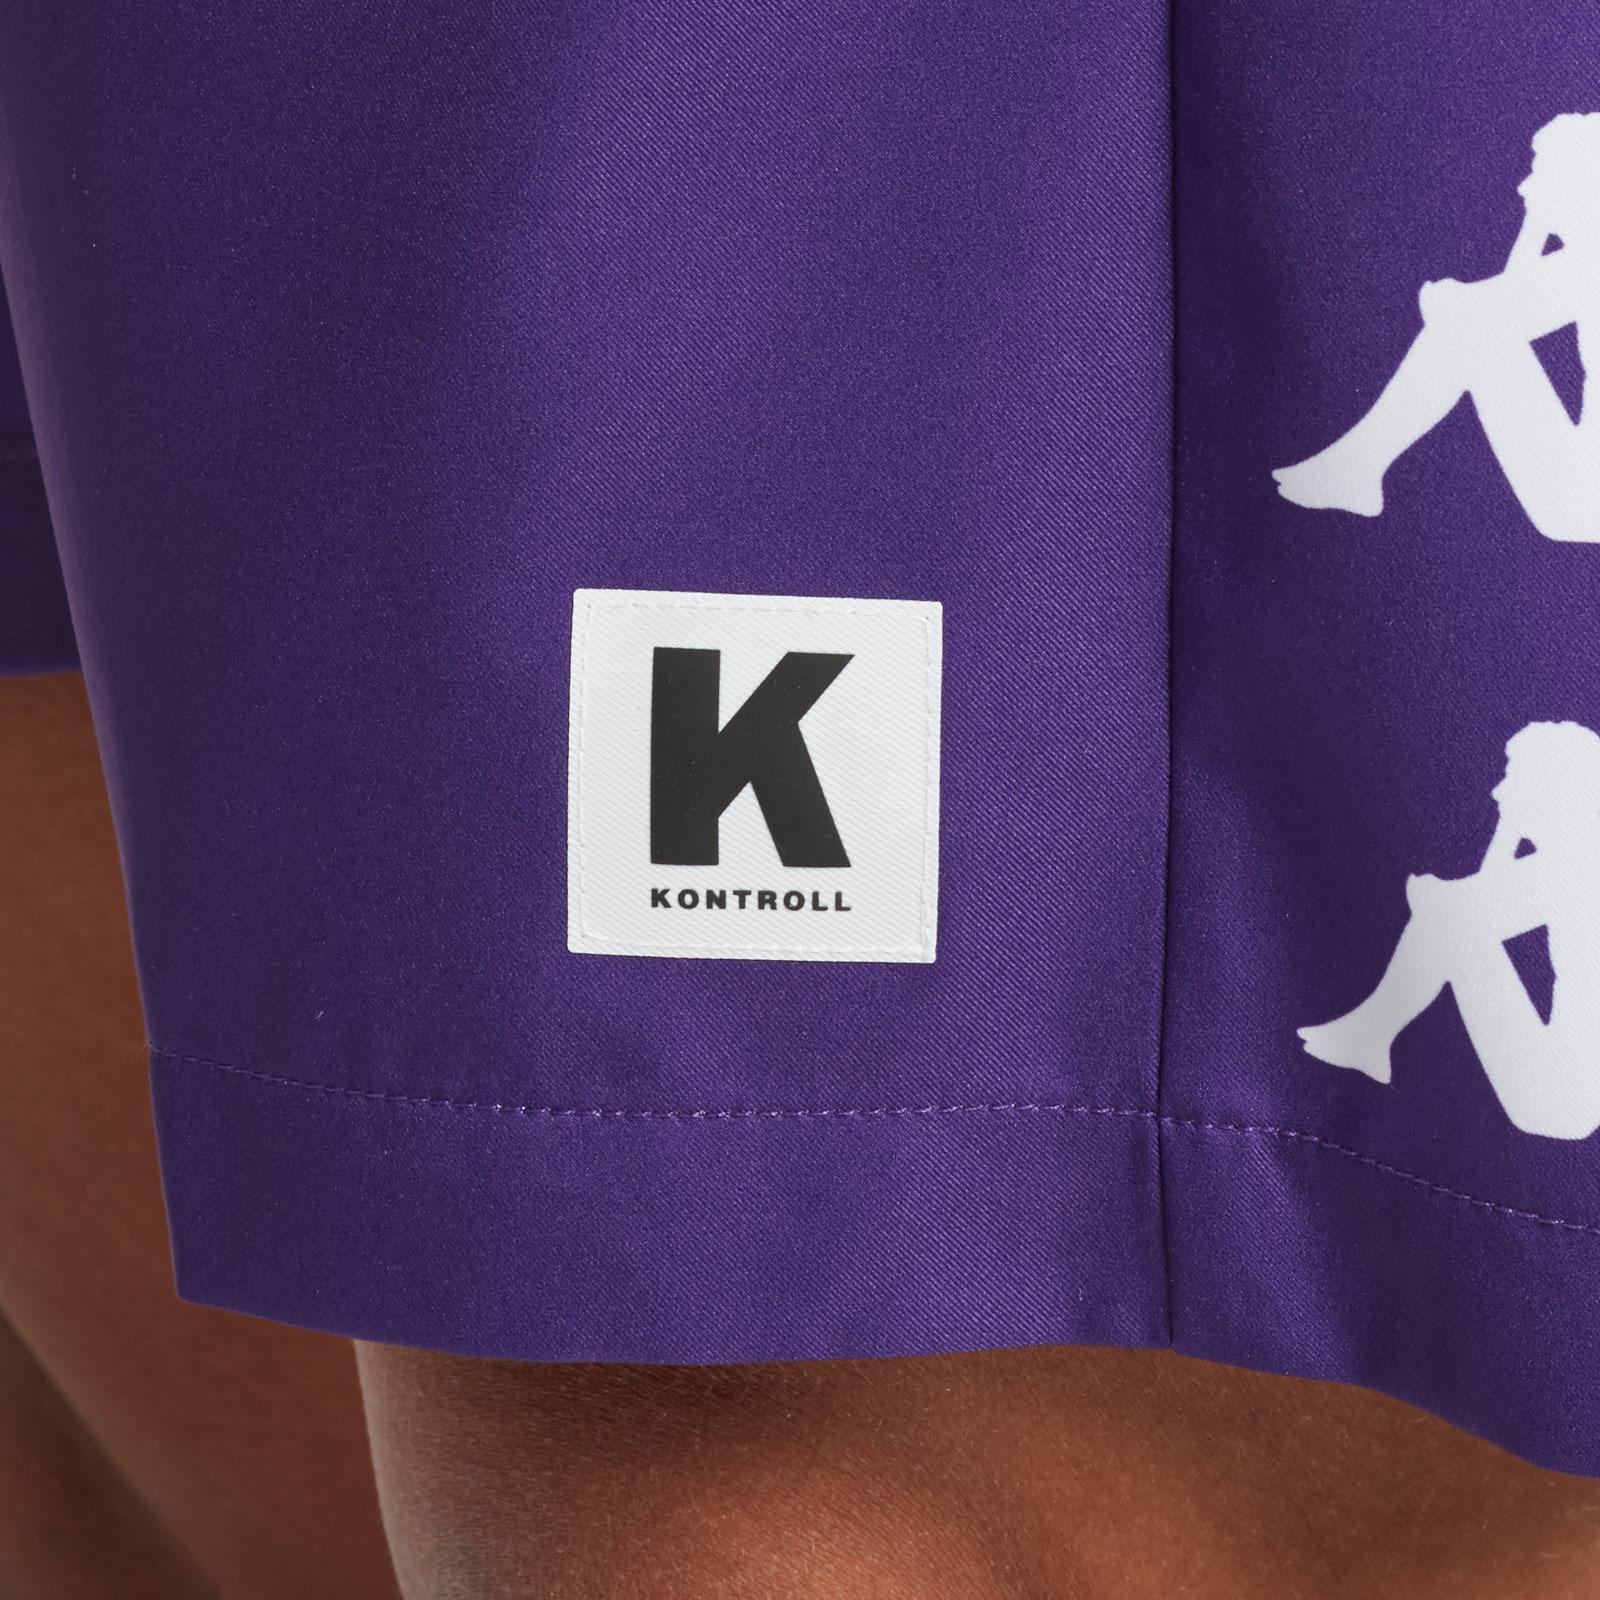 624f6a8ea6 Kappa Kontroll Swimming Trunk - 303xei0 - Sneakersnstuff | sneakers ...